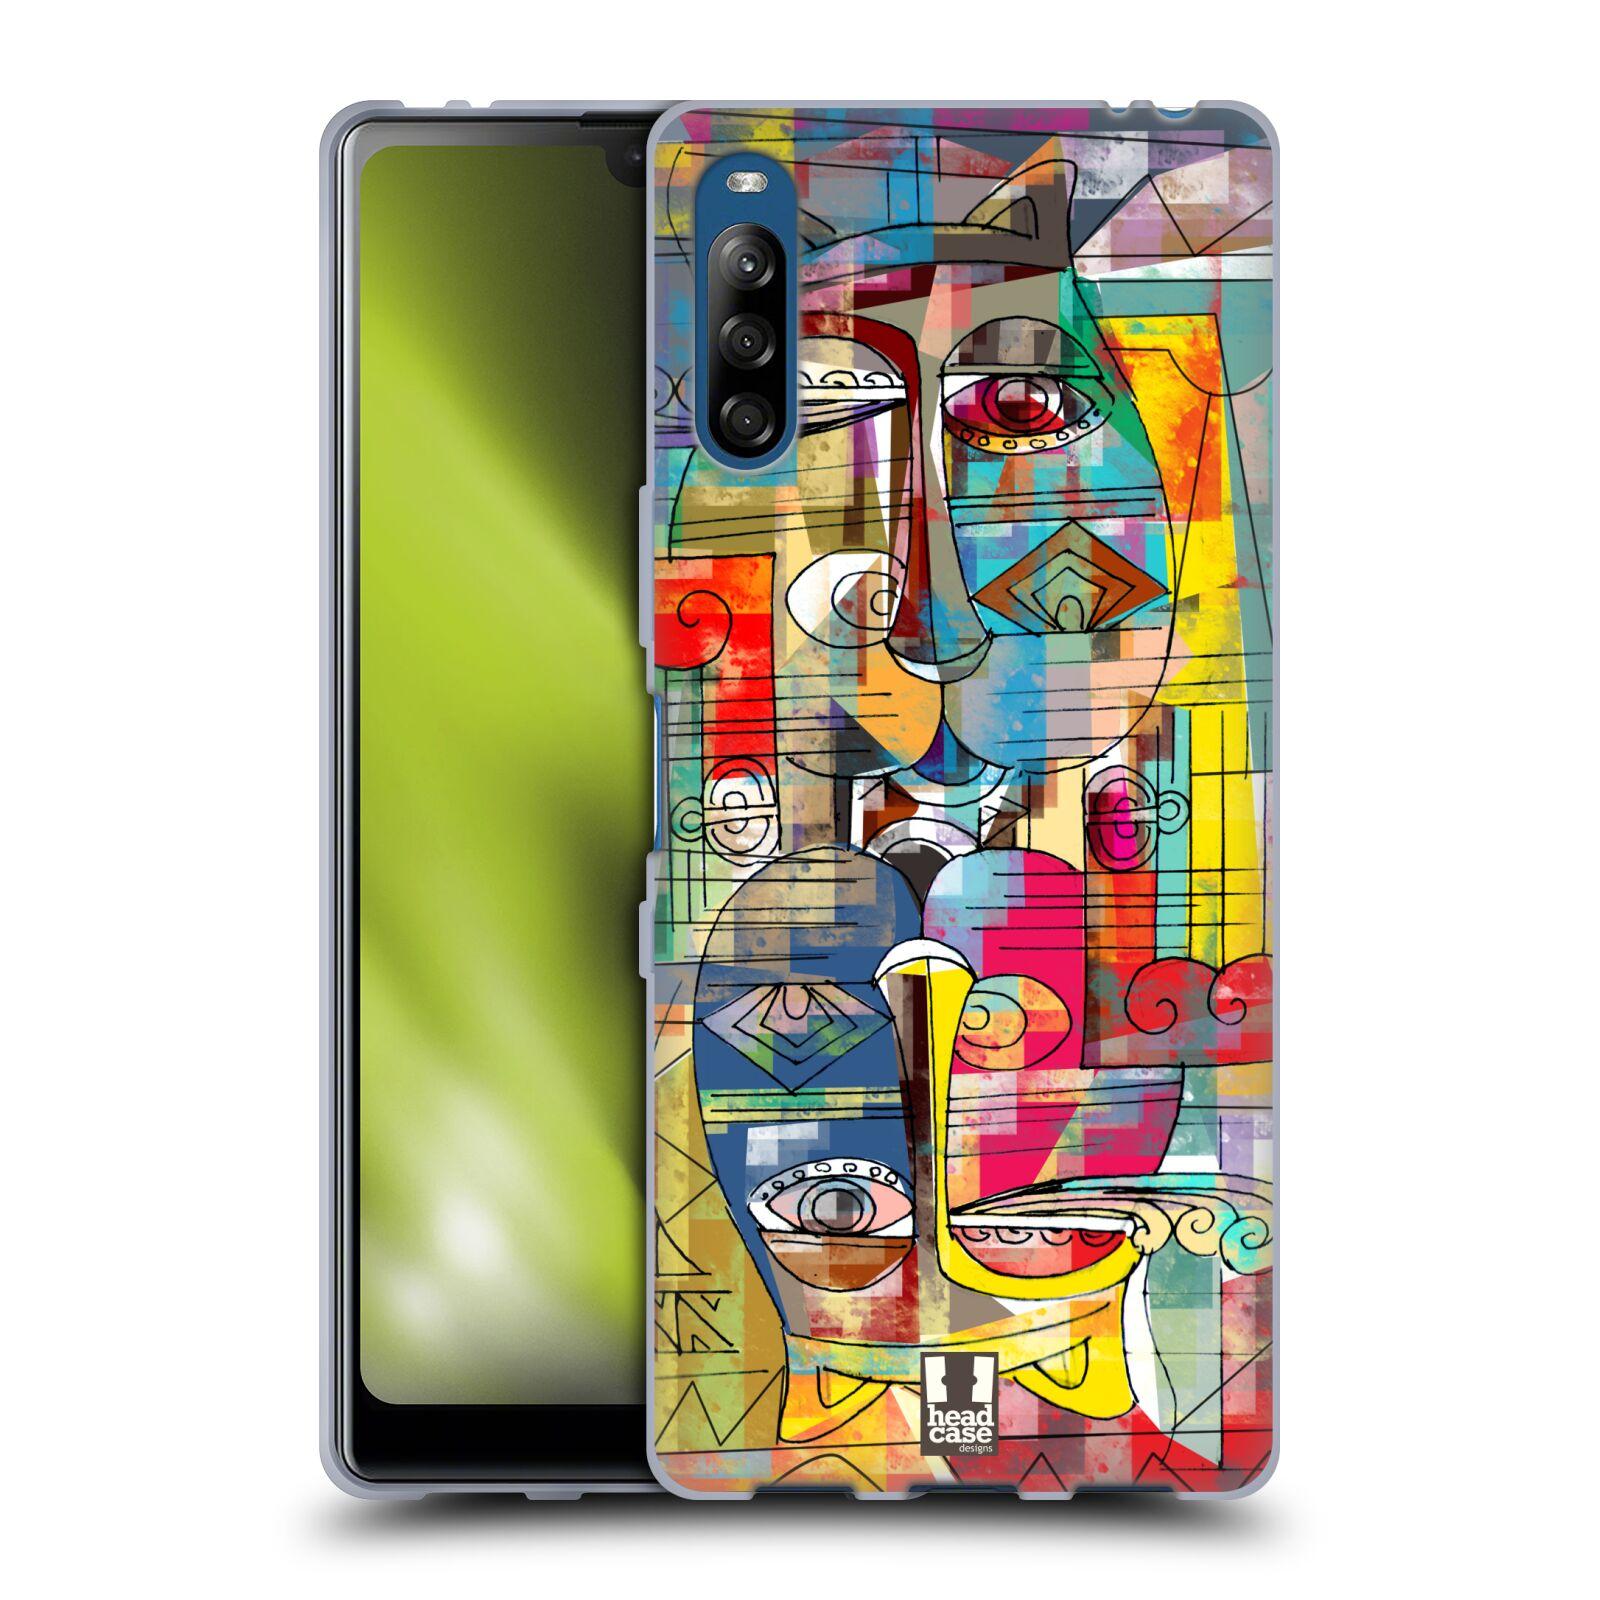 Silikonové pouzdro na mobil Sony Xperia L4 - Head Case - AZTEC MANX